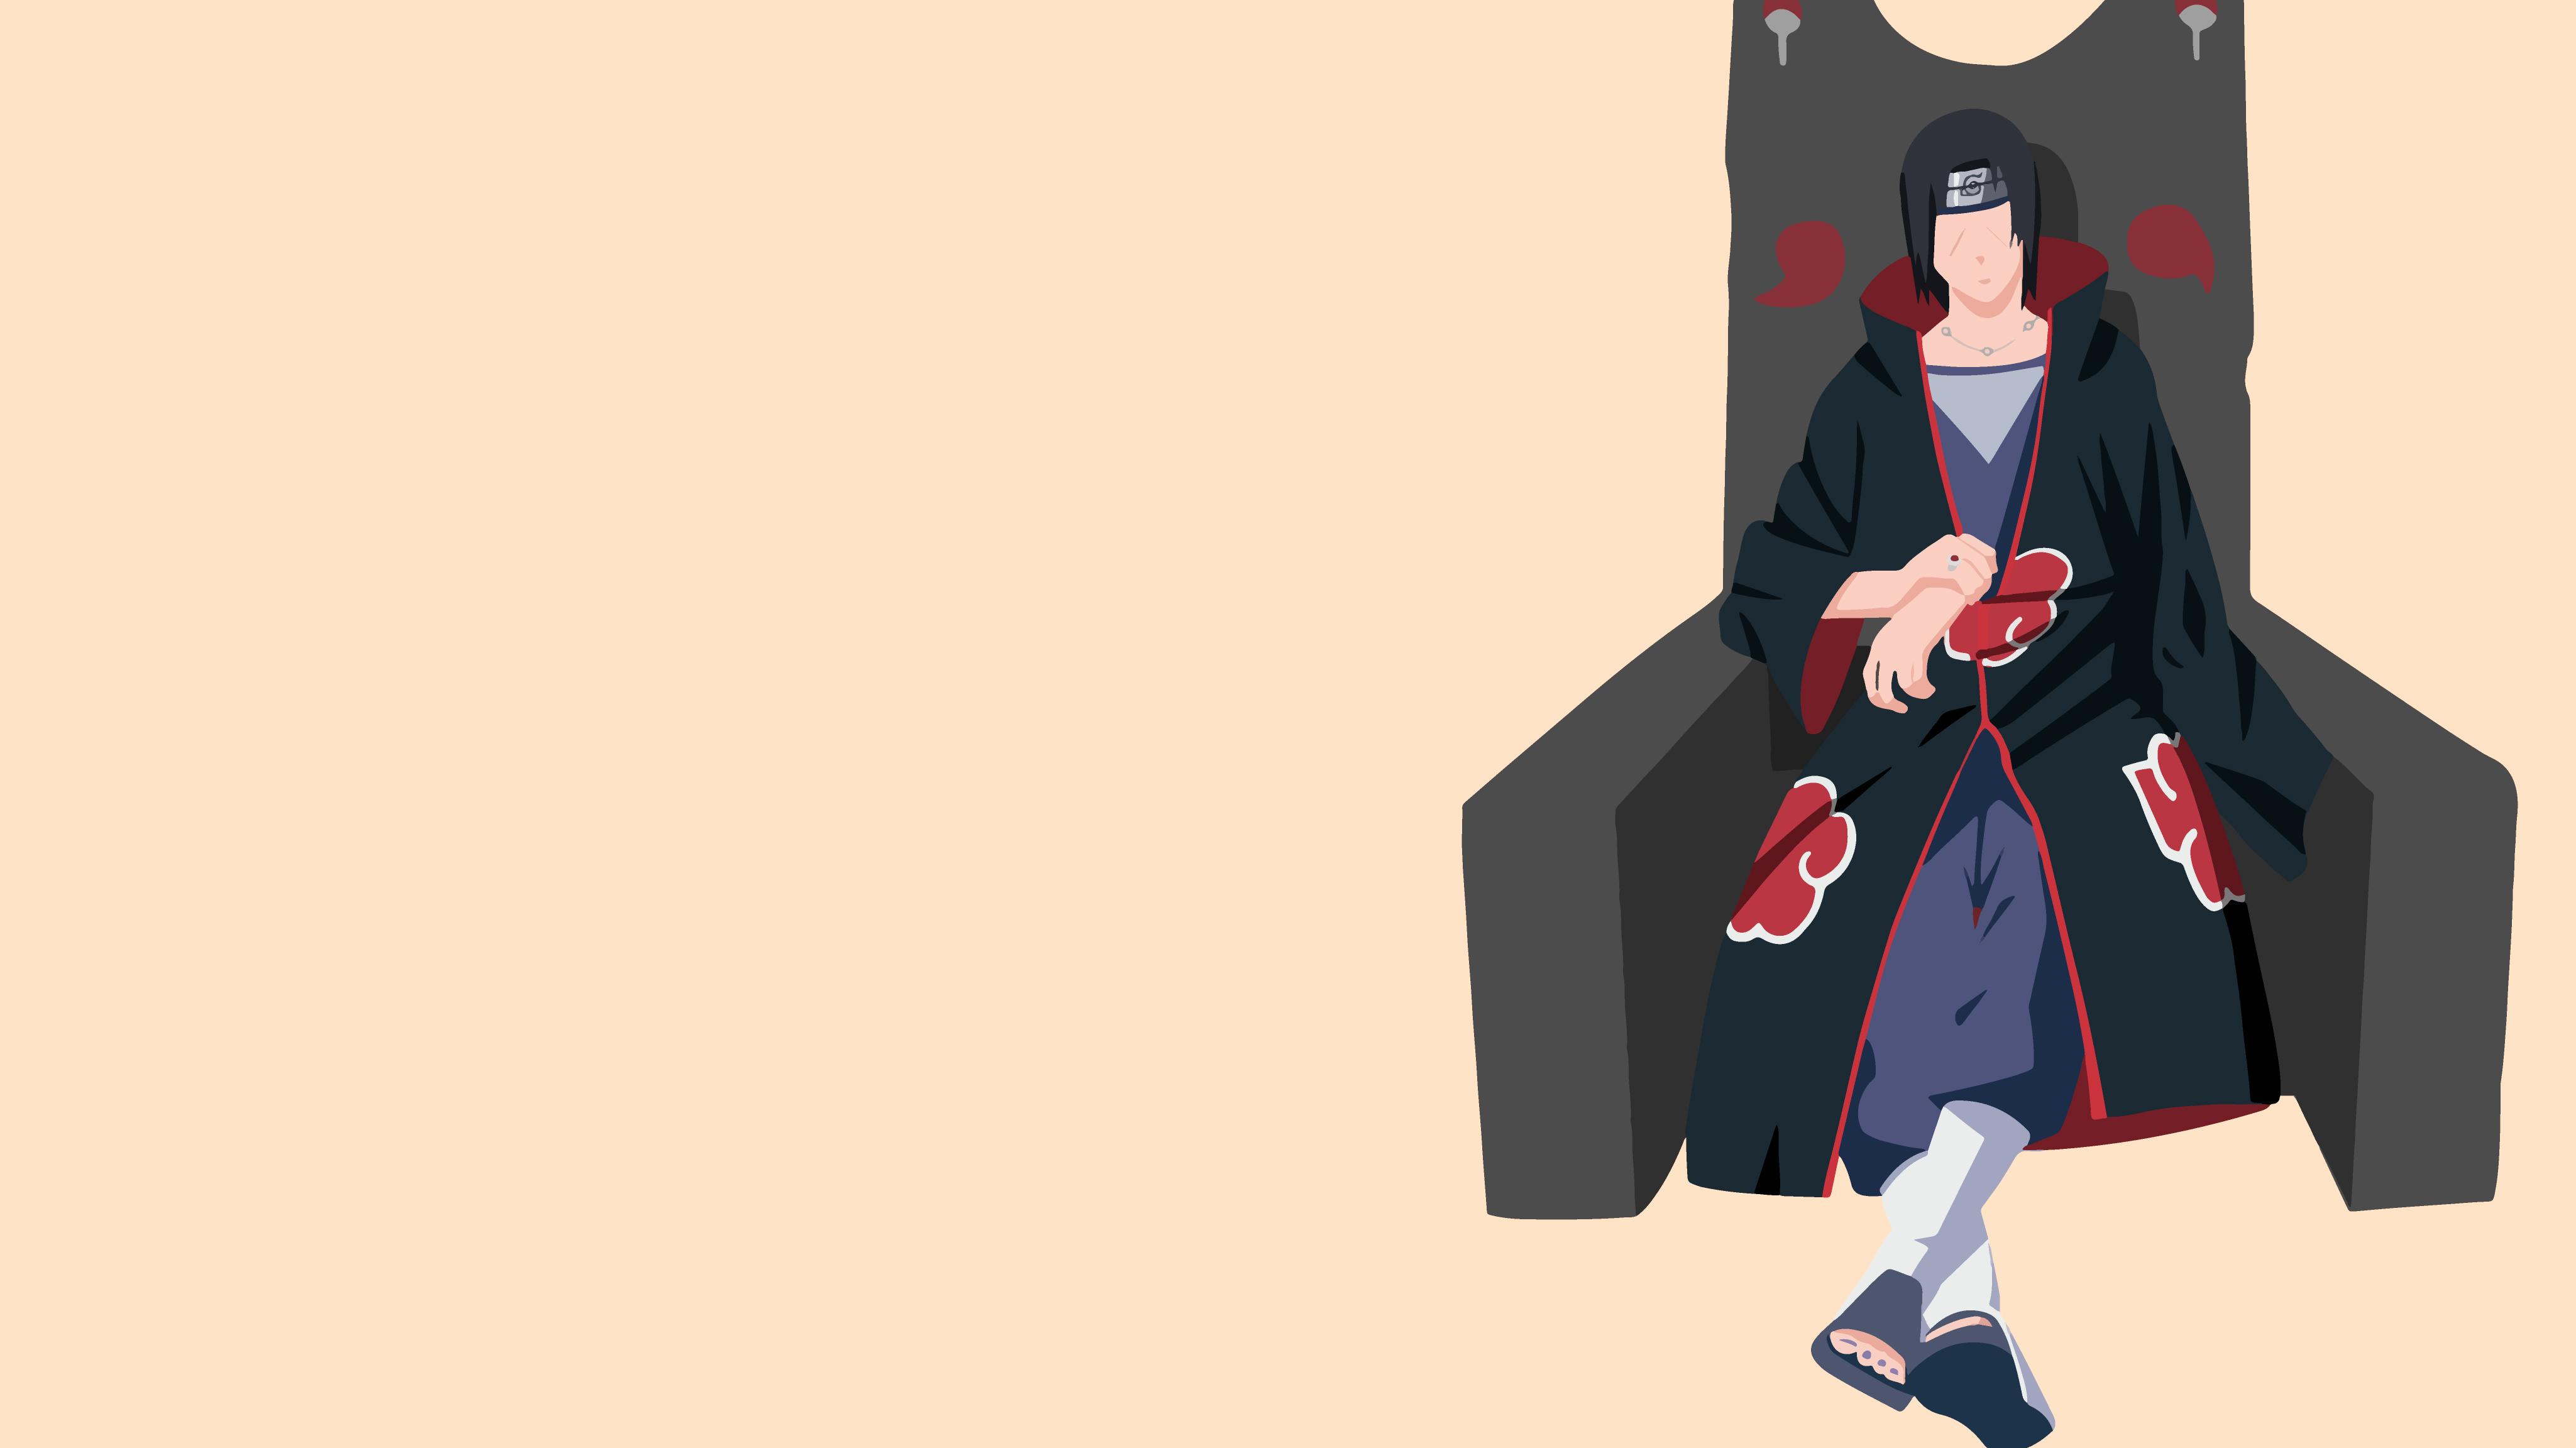 Akatsuki Naruto Black Hair Itachi Uchiha Minimalist Naruto Throne Uchiha Clan Warrior 4098x2304